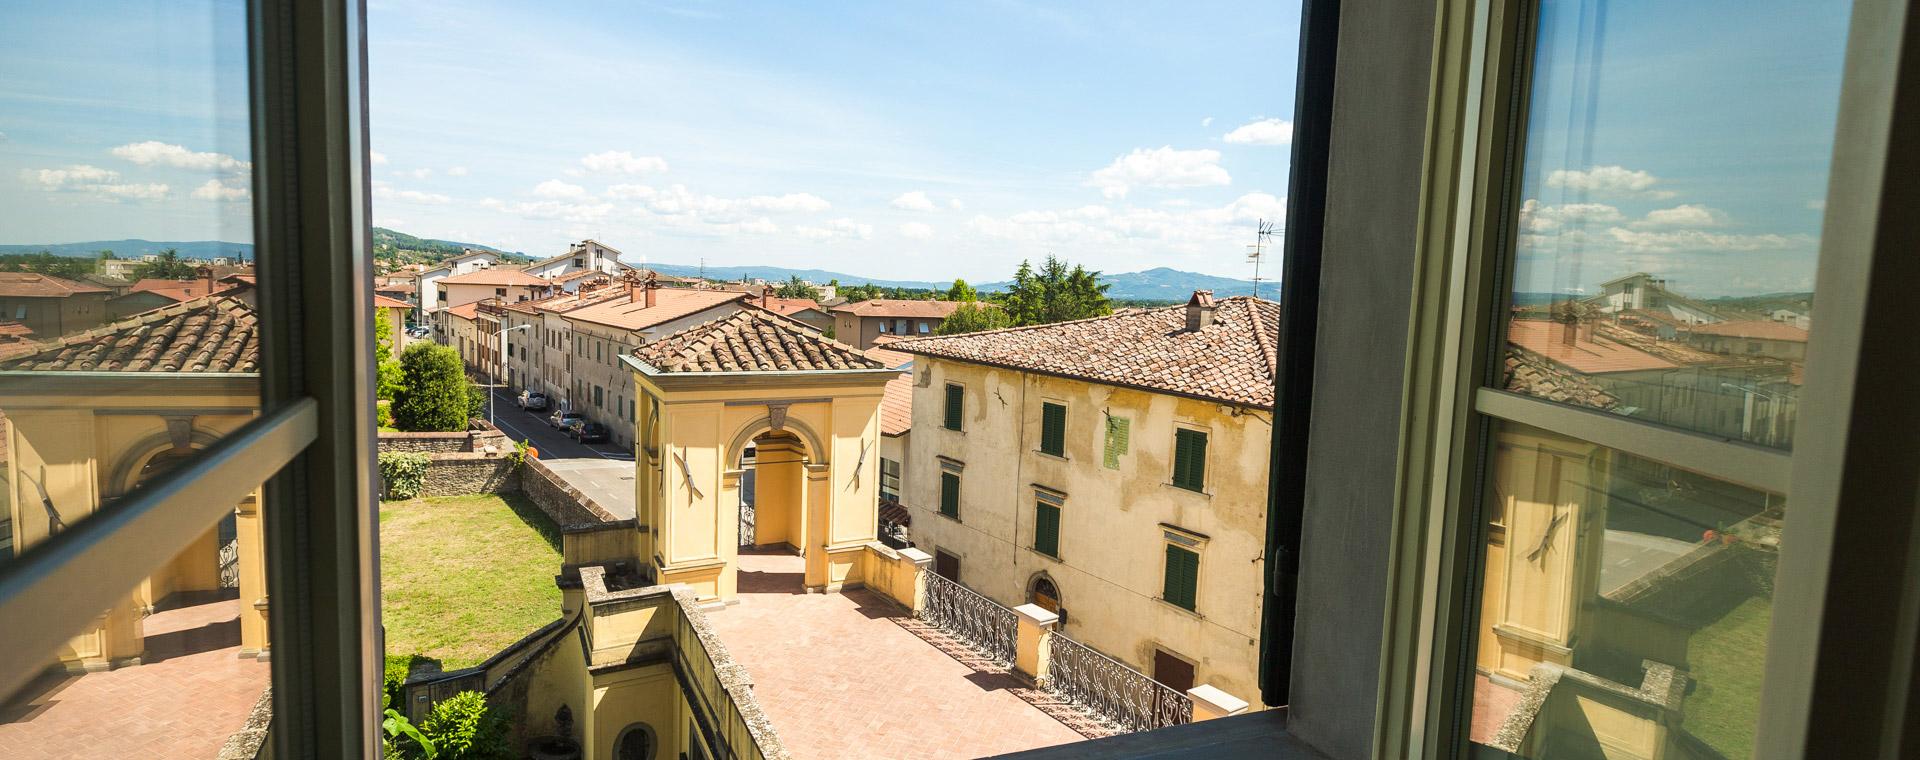 Toscana villa d'epoca in vendita